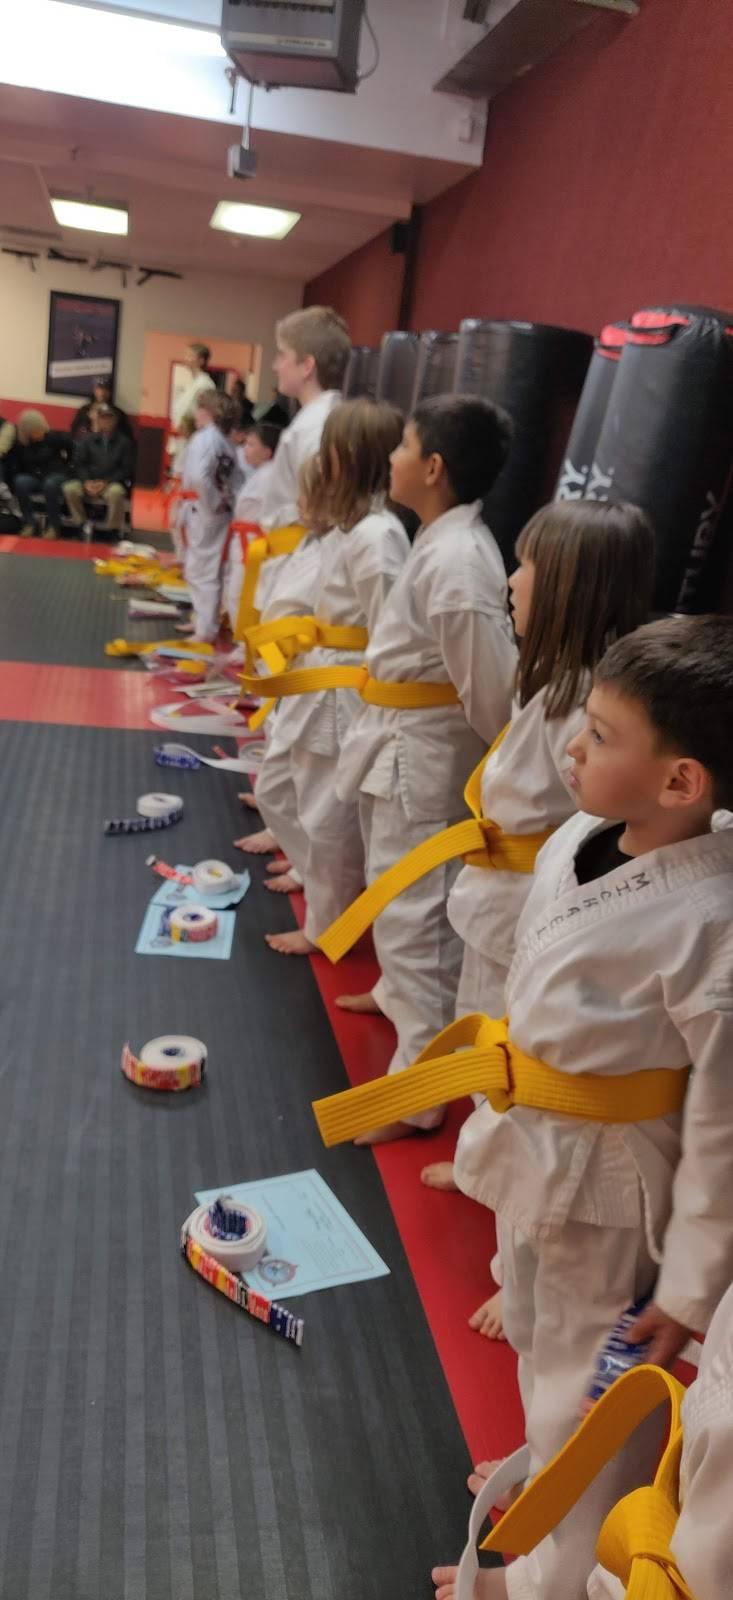 Personal Achievement Martial Arts - school  | Photo 7 of 7 | Address: 3964 Youngfield St, Wheat Ridge, CO 80033, USA | Phone: (720) 287-3796